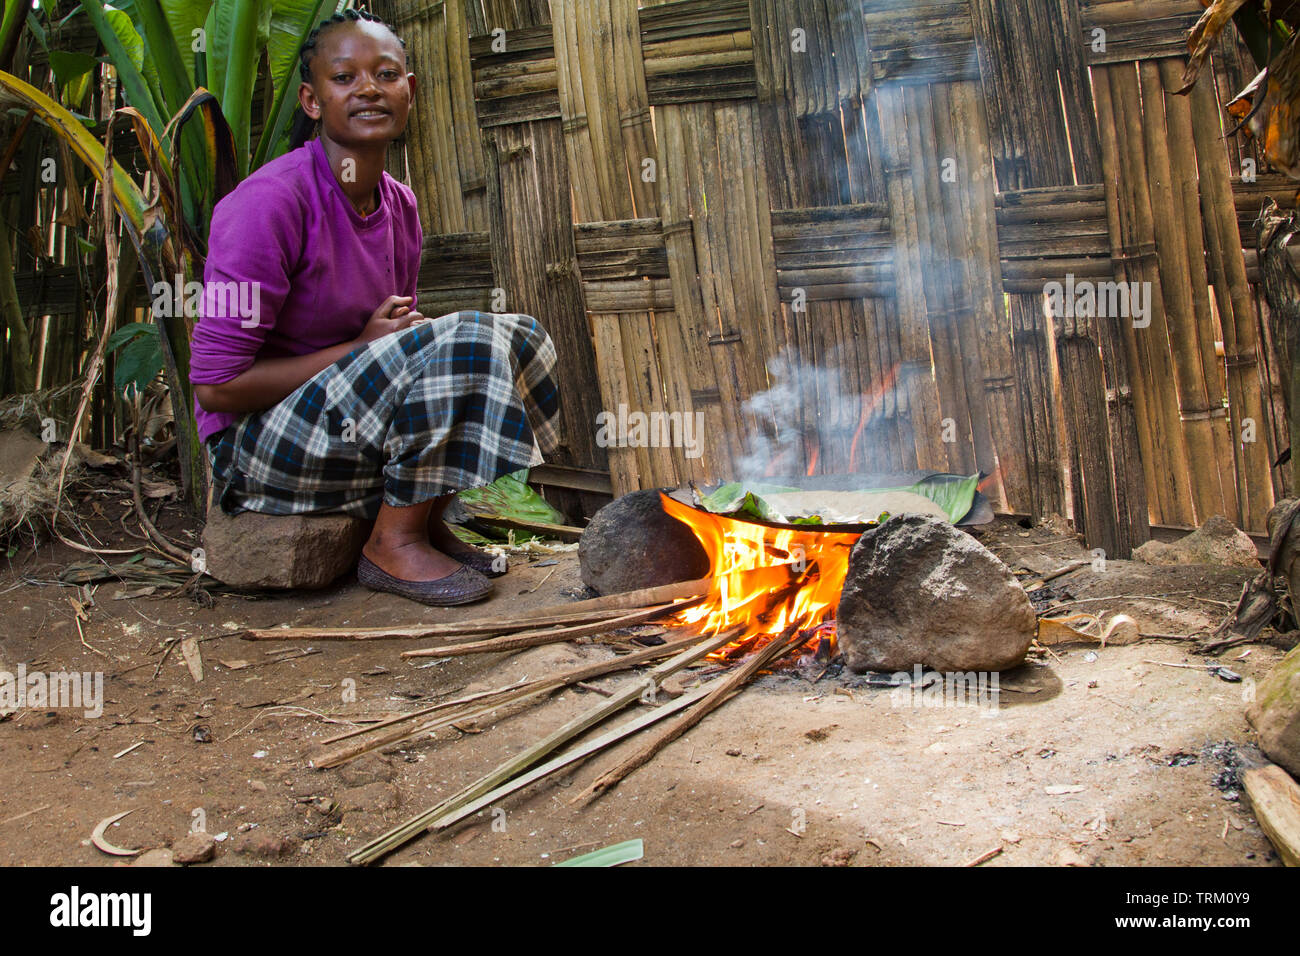 A Dorze Woman Prepares Kocho (Unleavened Bread) Made from The False Banana Tree, Hayzo Village, Arba Minch, Ethiopia Stock Photo